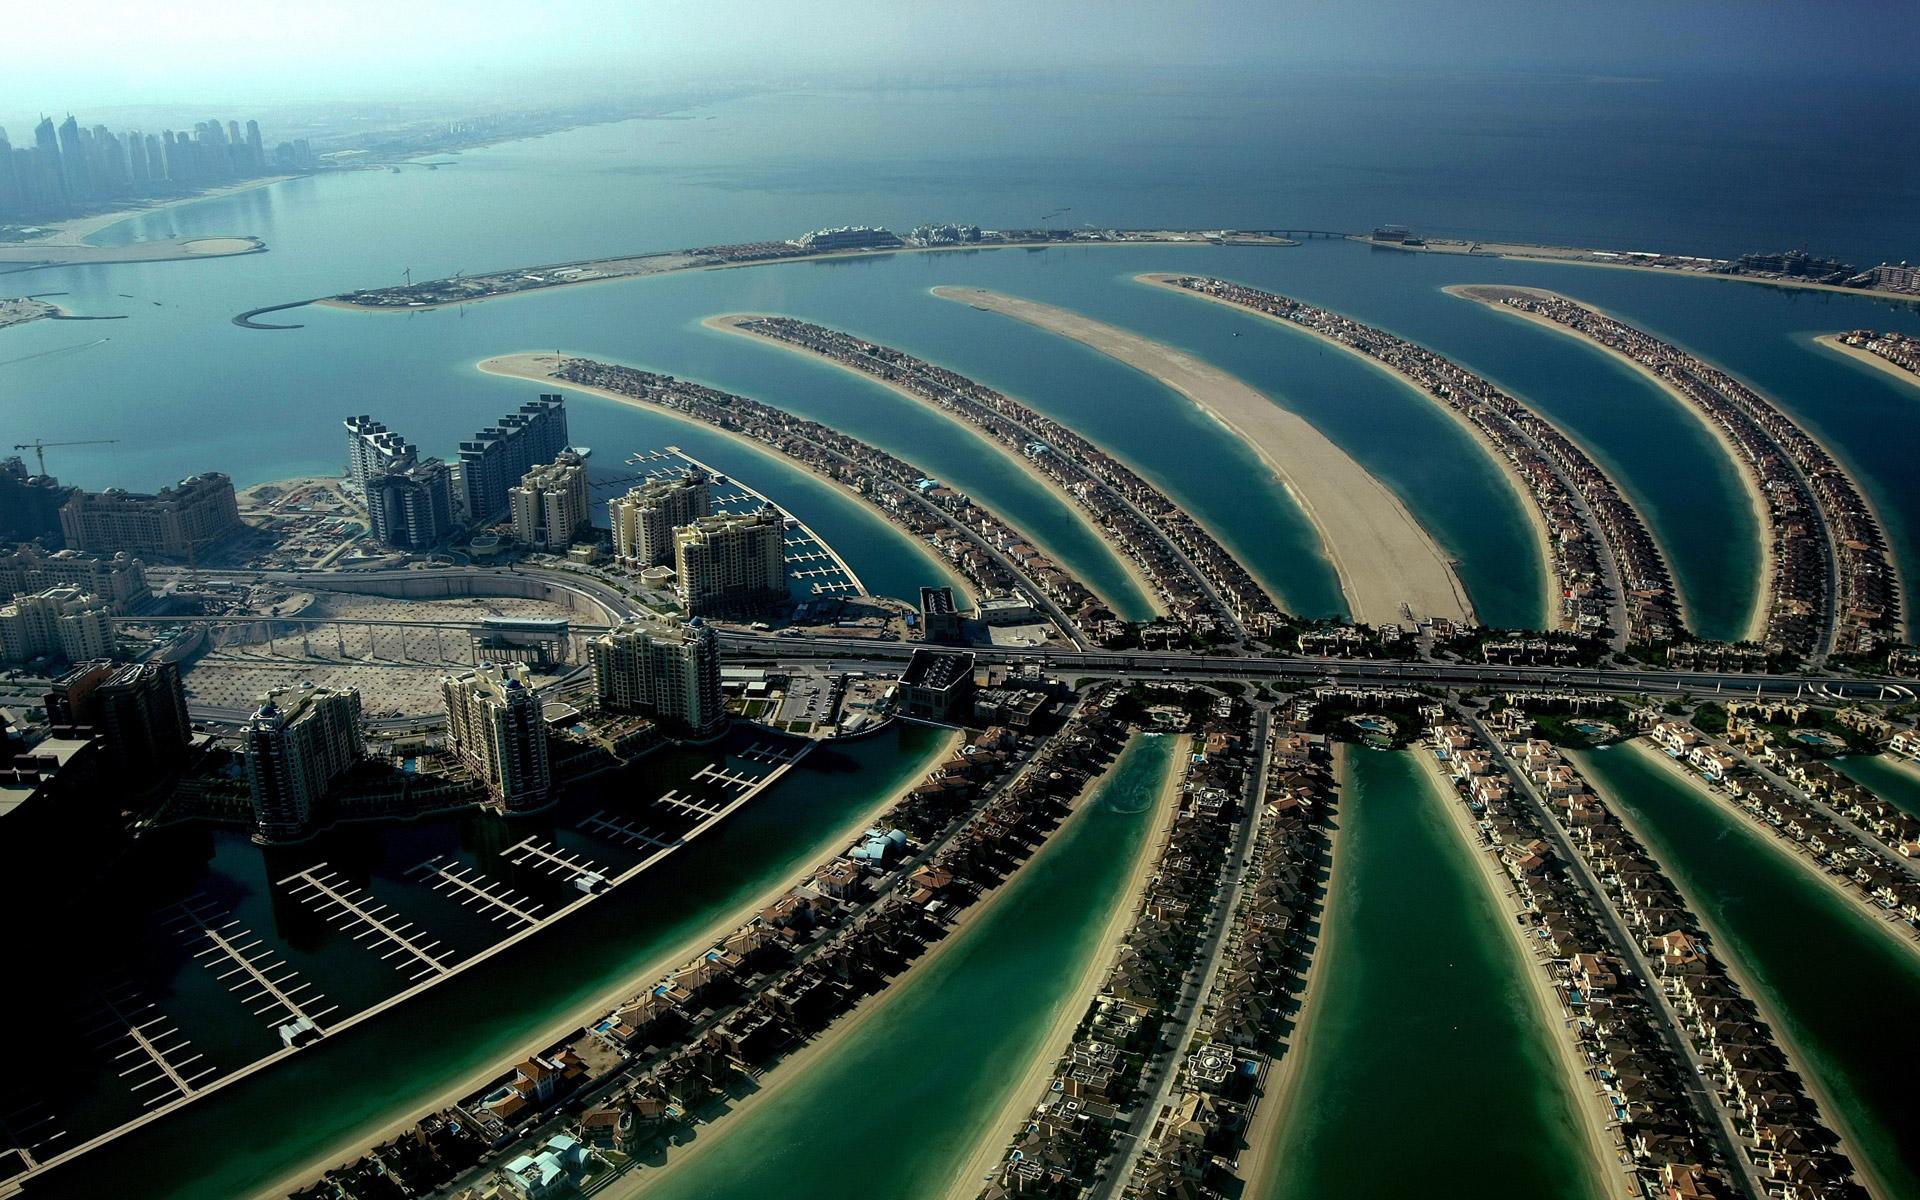 Dubai City HD WallpapersDownload Dubai City Wallpapers HD 1920x1200